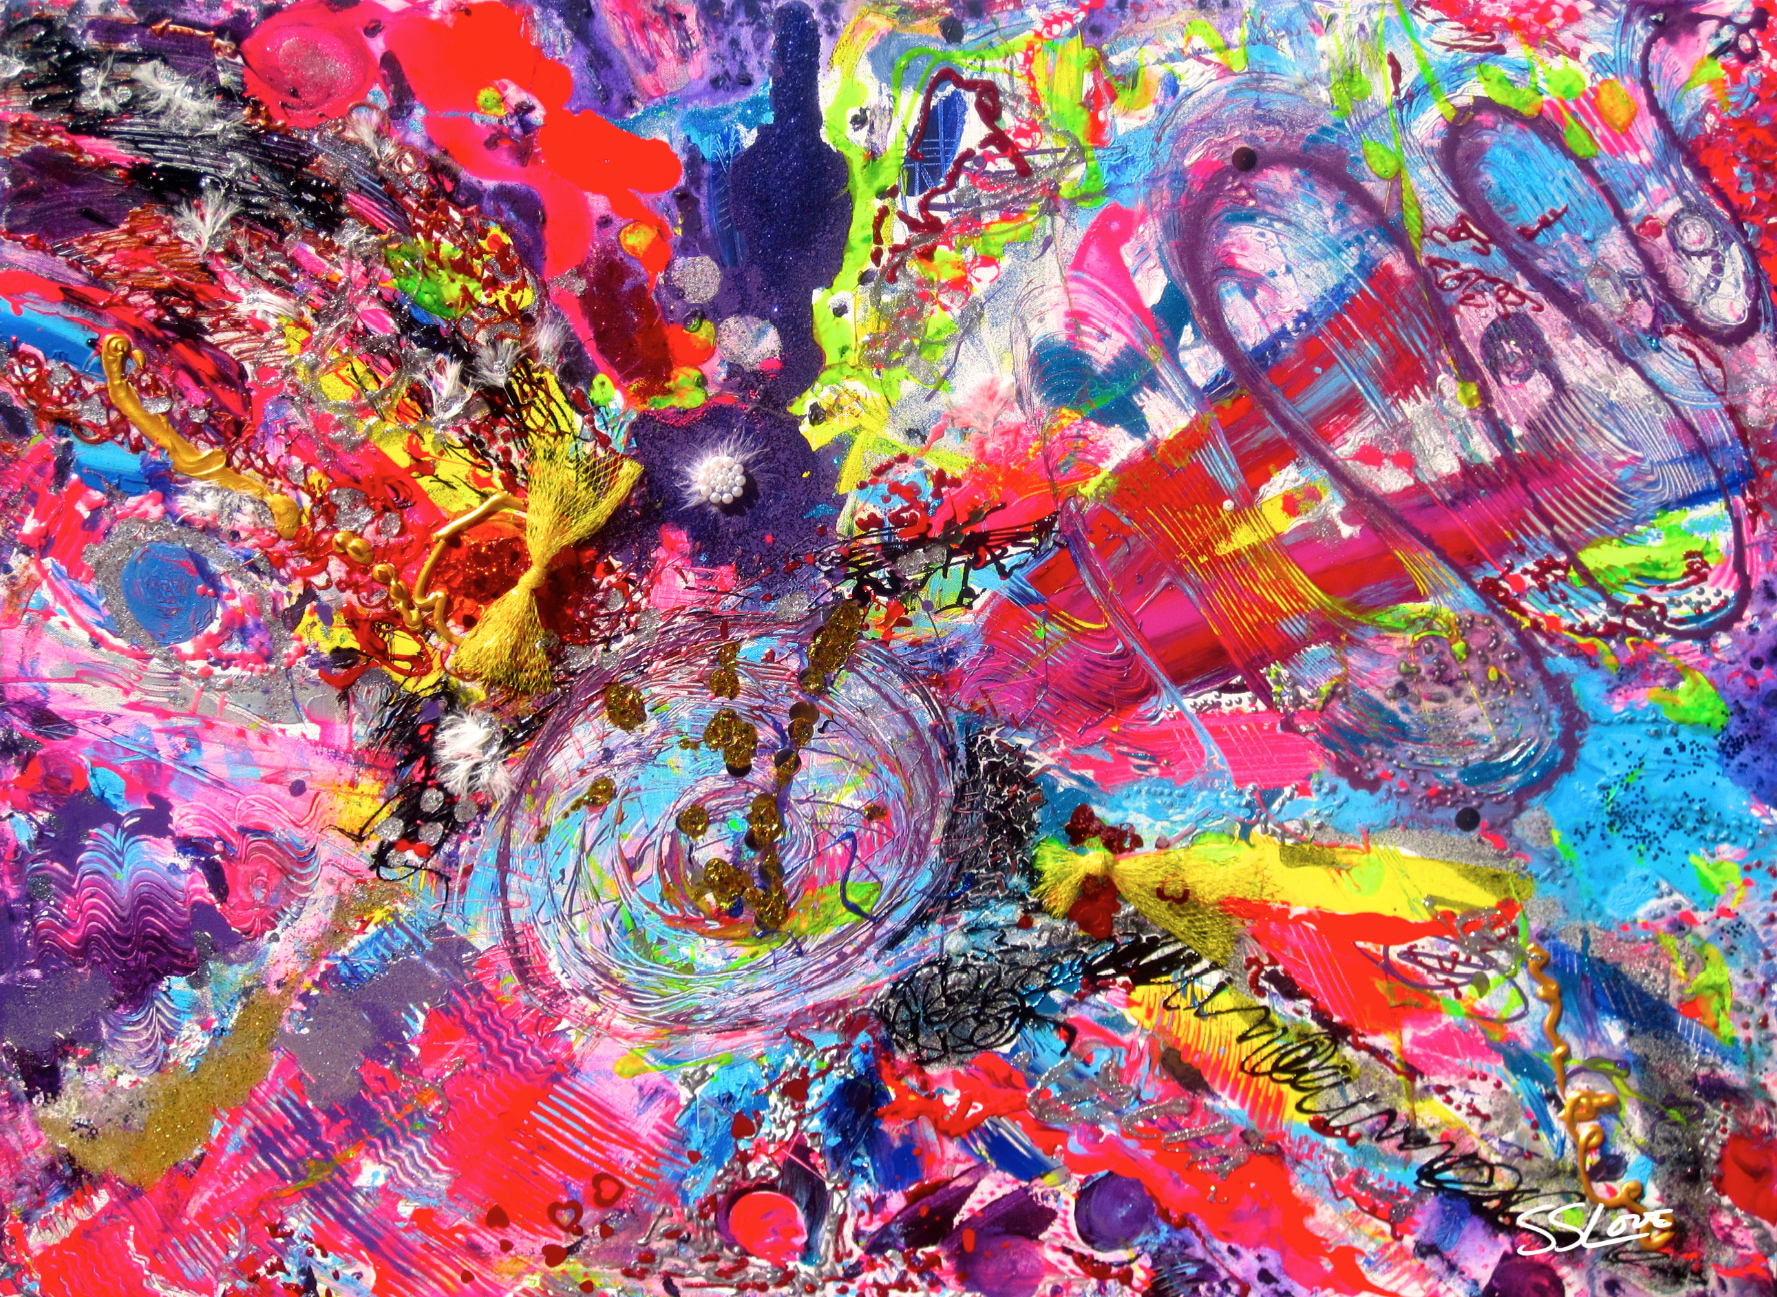 Blurred Lines SS Love 48x36